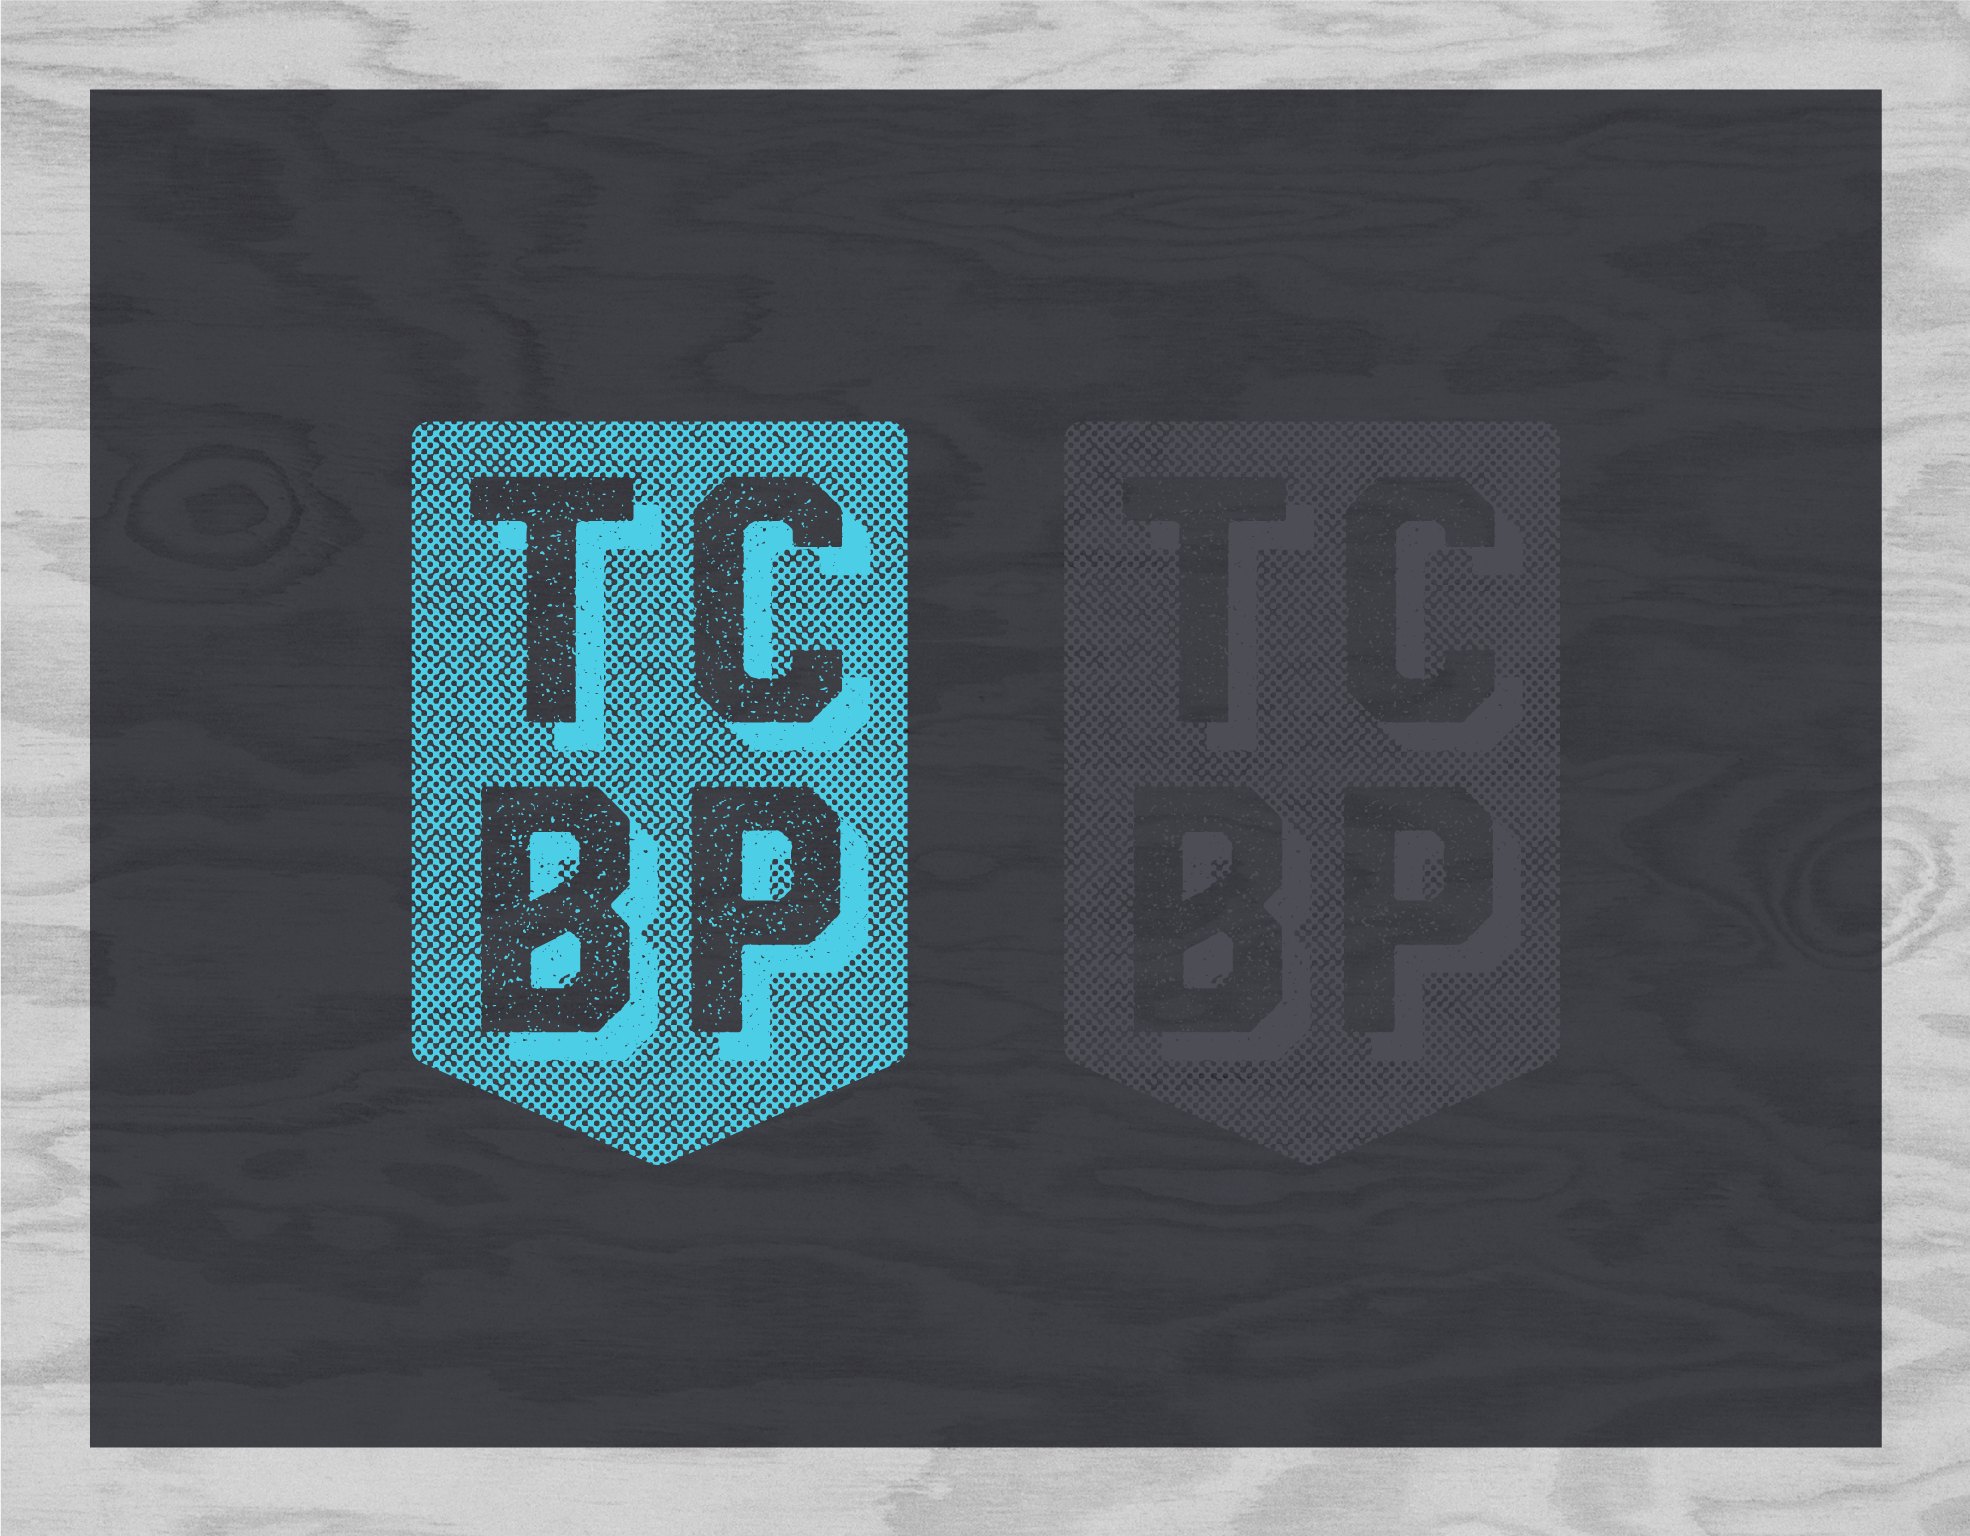 TCBP_Web_08.png